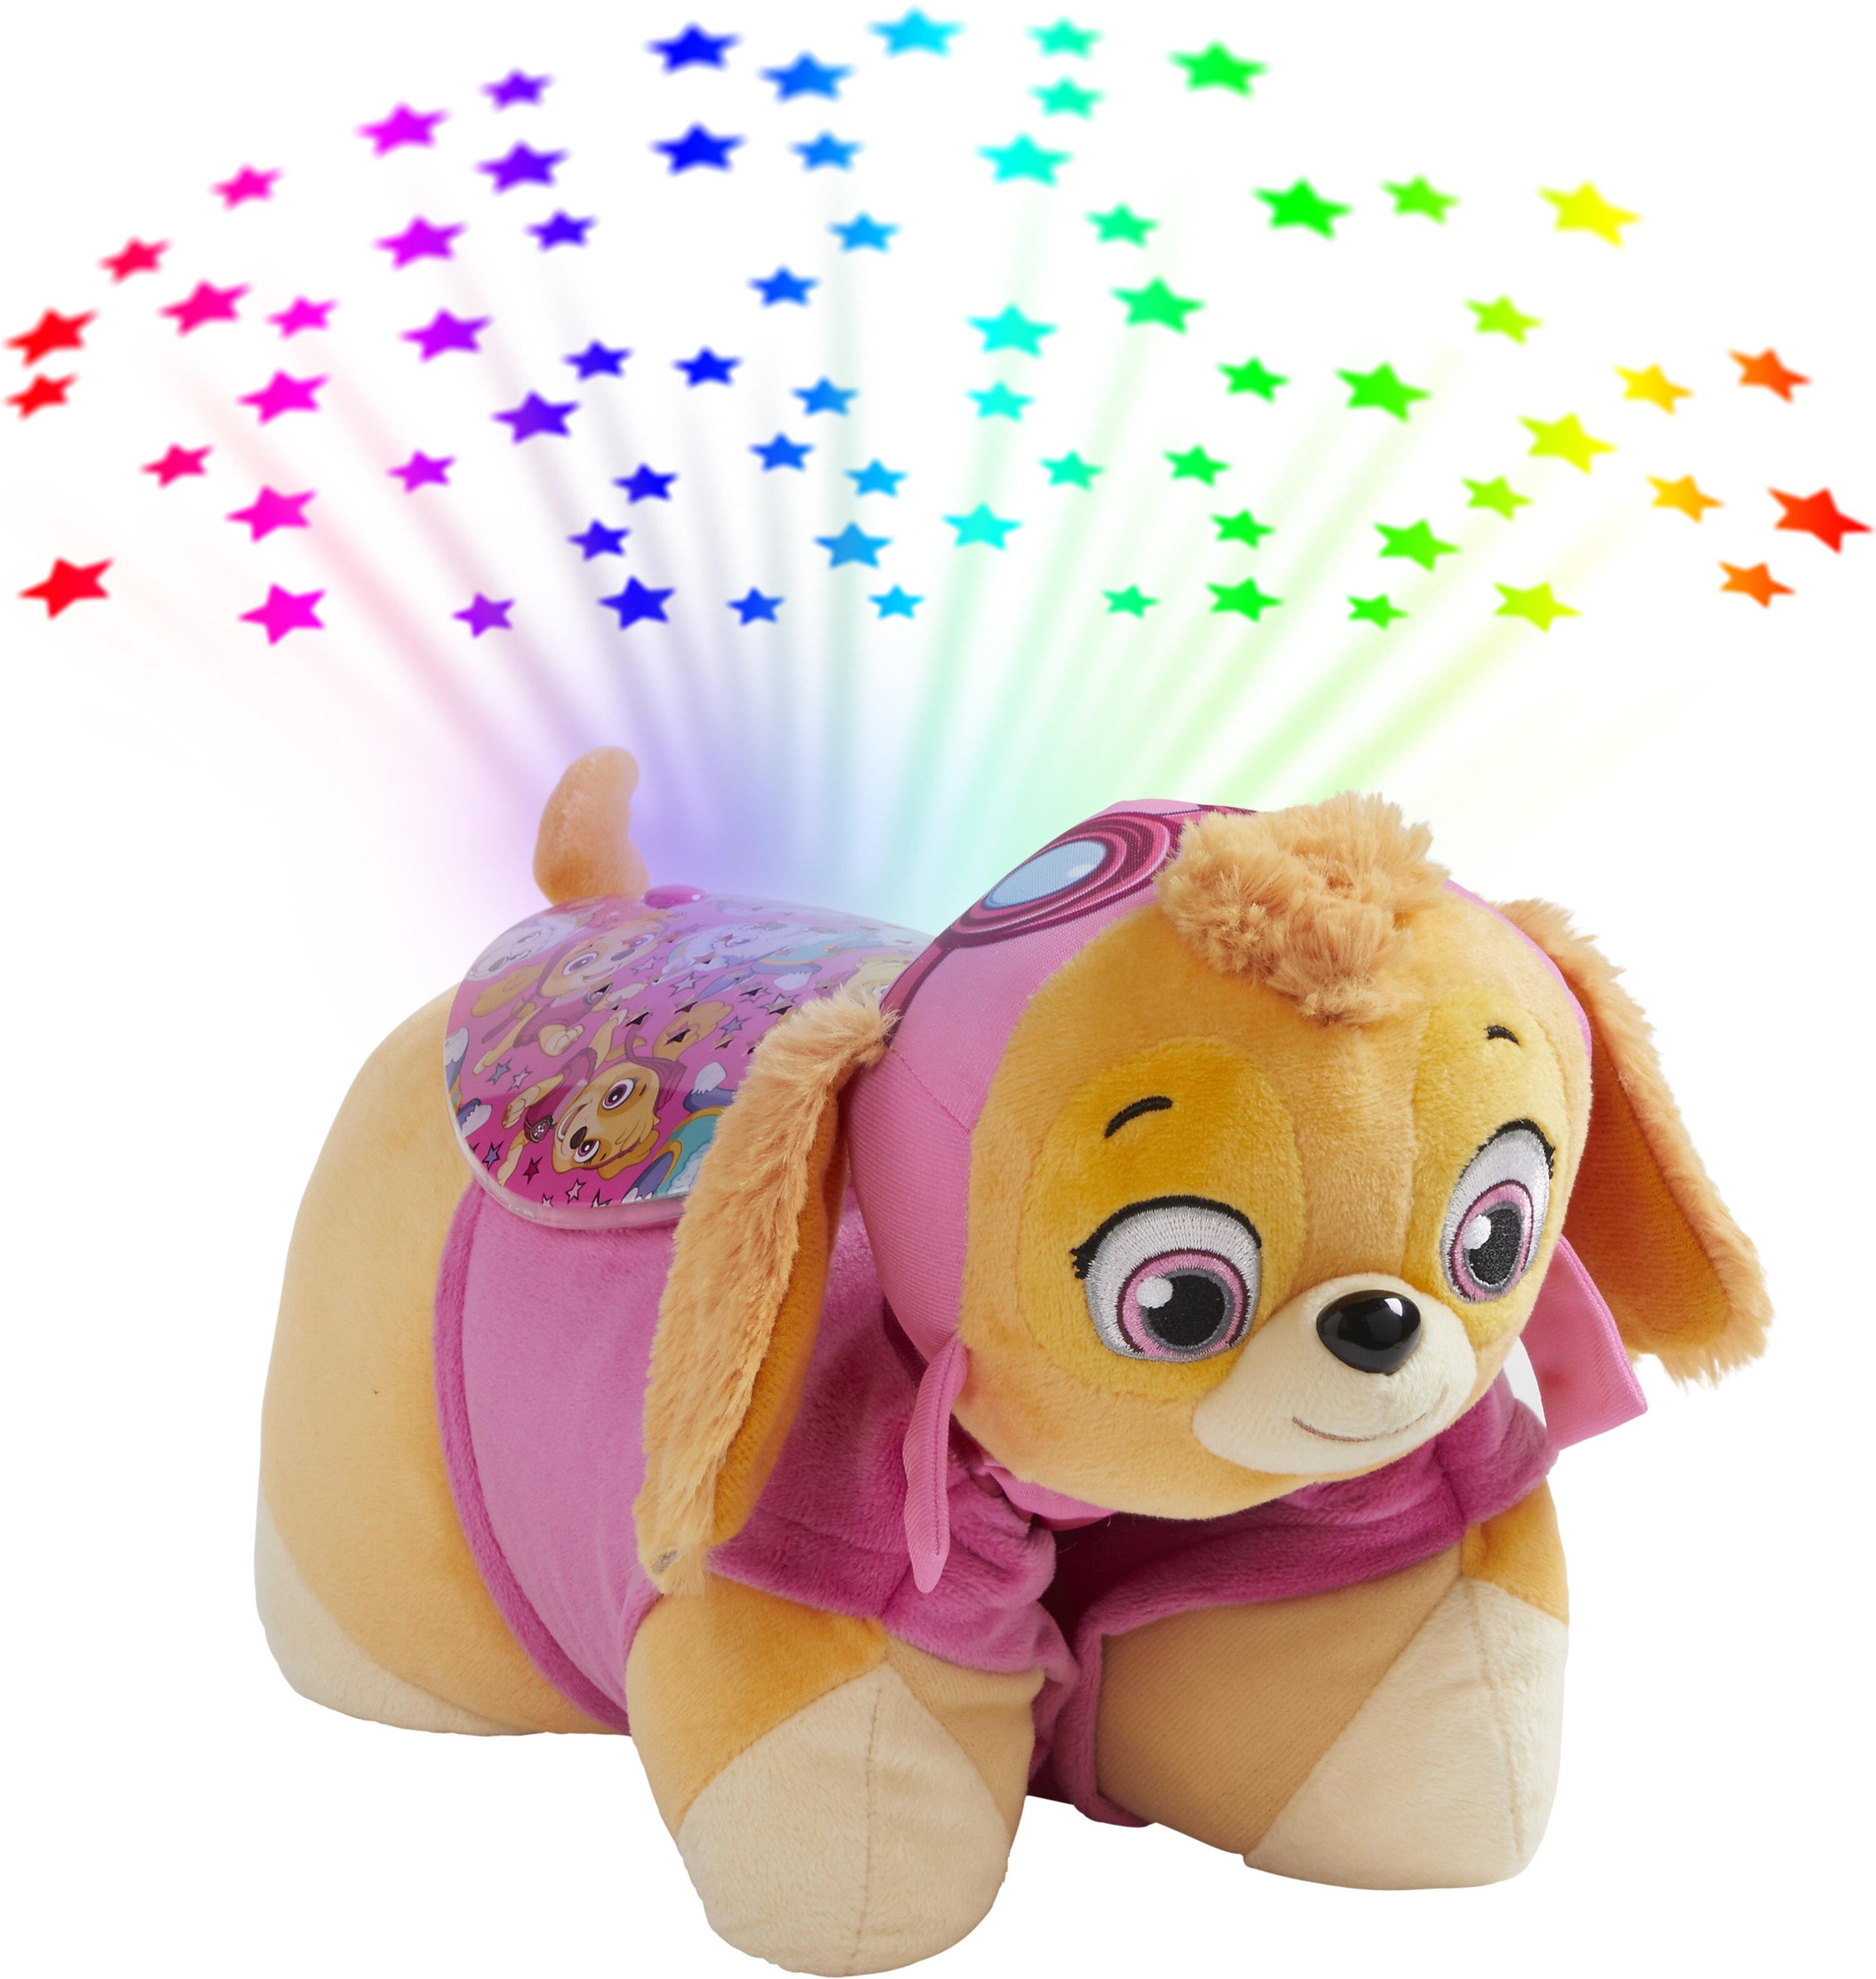 Genuine Nickelodeon Kid Paw Patrol Nightlight With Projection Birthday Xmas Gift